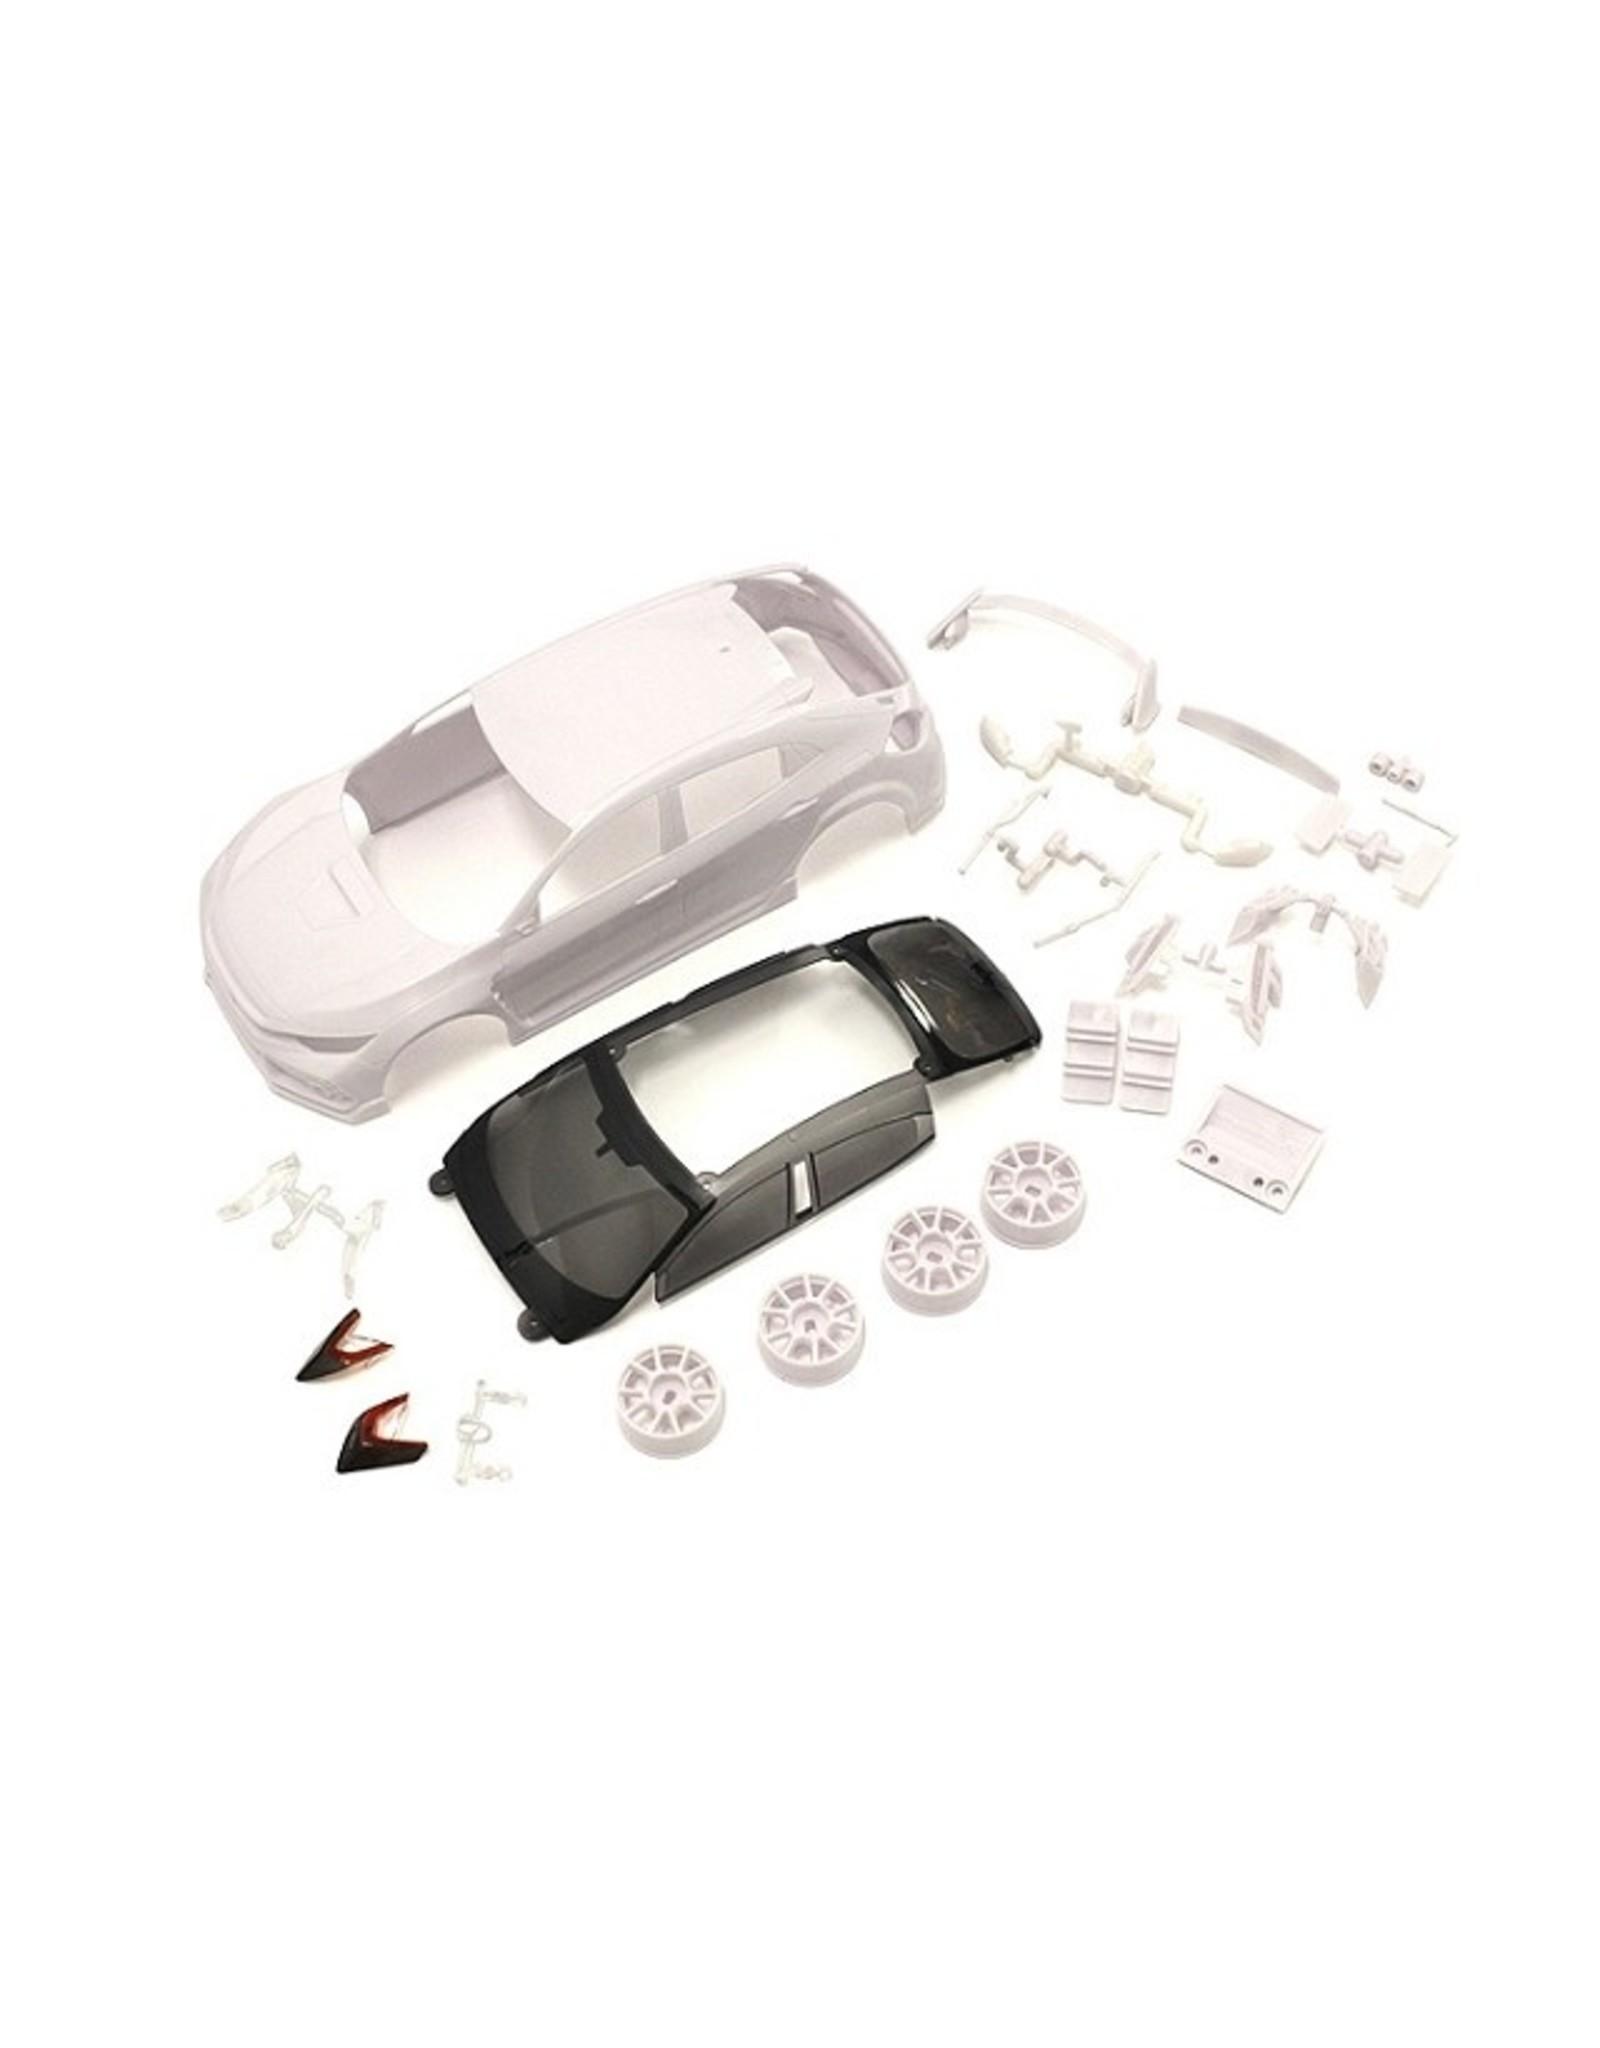 Kyosho Honda CIVIC TYPE R White body set (w/Wheel)  (MZN194)